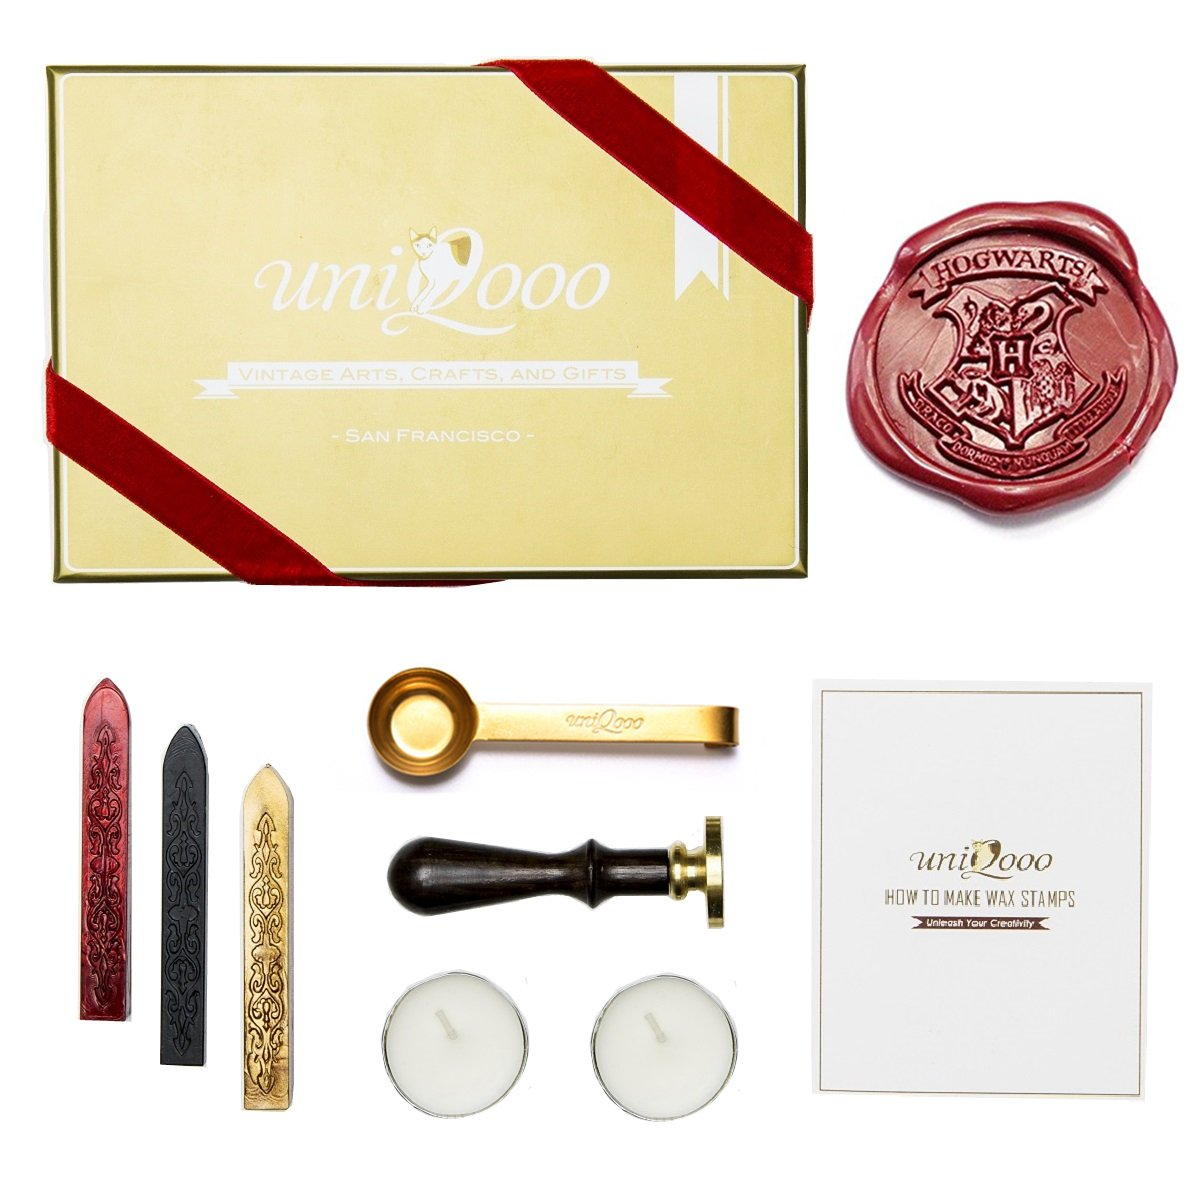 UNIQOOO Arts & Crafts Hogwarts School Ministry of Magic Wax Seal Stamp Kit, Gift Idea GIFTS